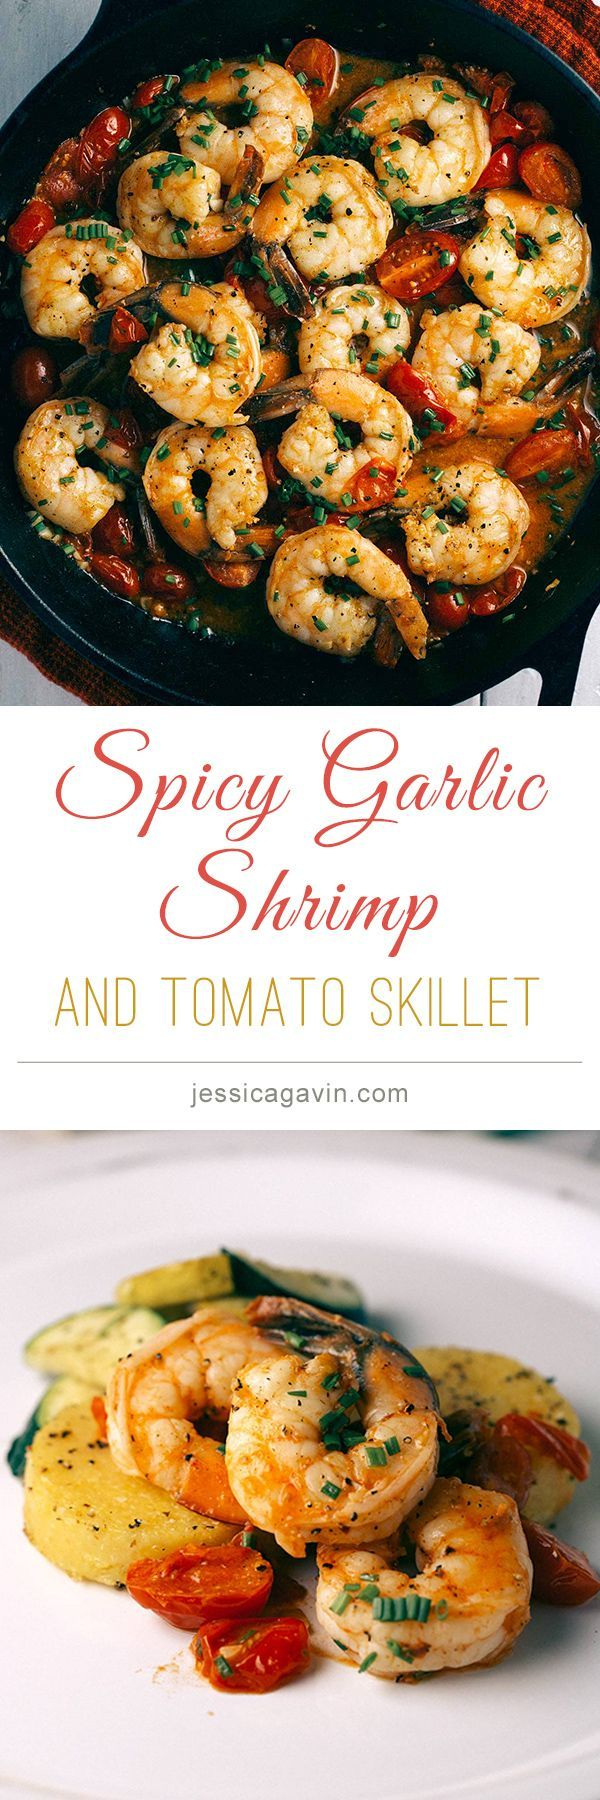 Spicy Garlic Jumbo Shrimp and Tomato Skillet | jessicagavin.com #seafoodrecipes #appetizer